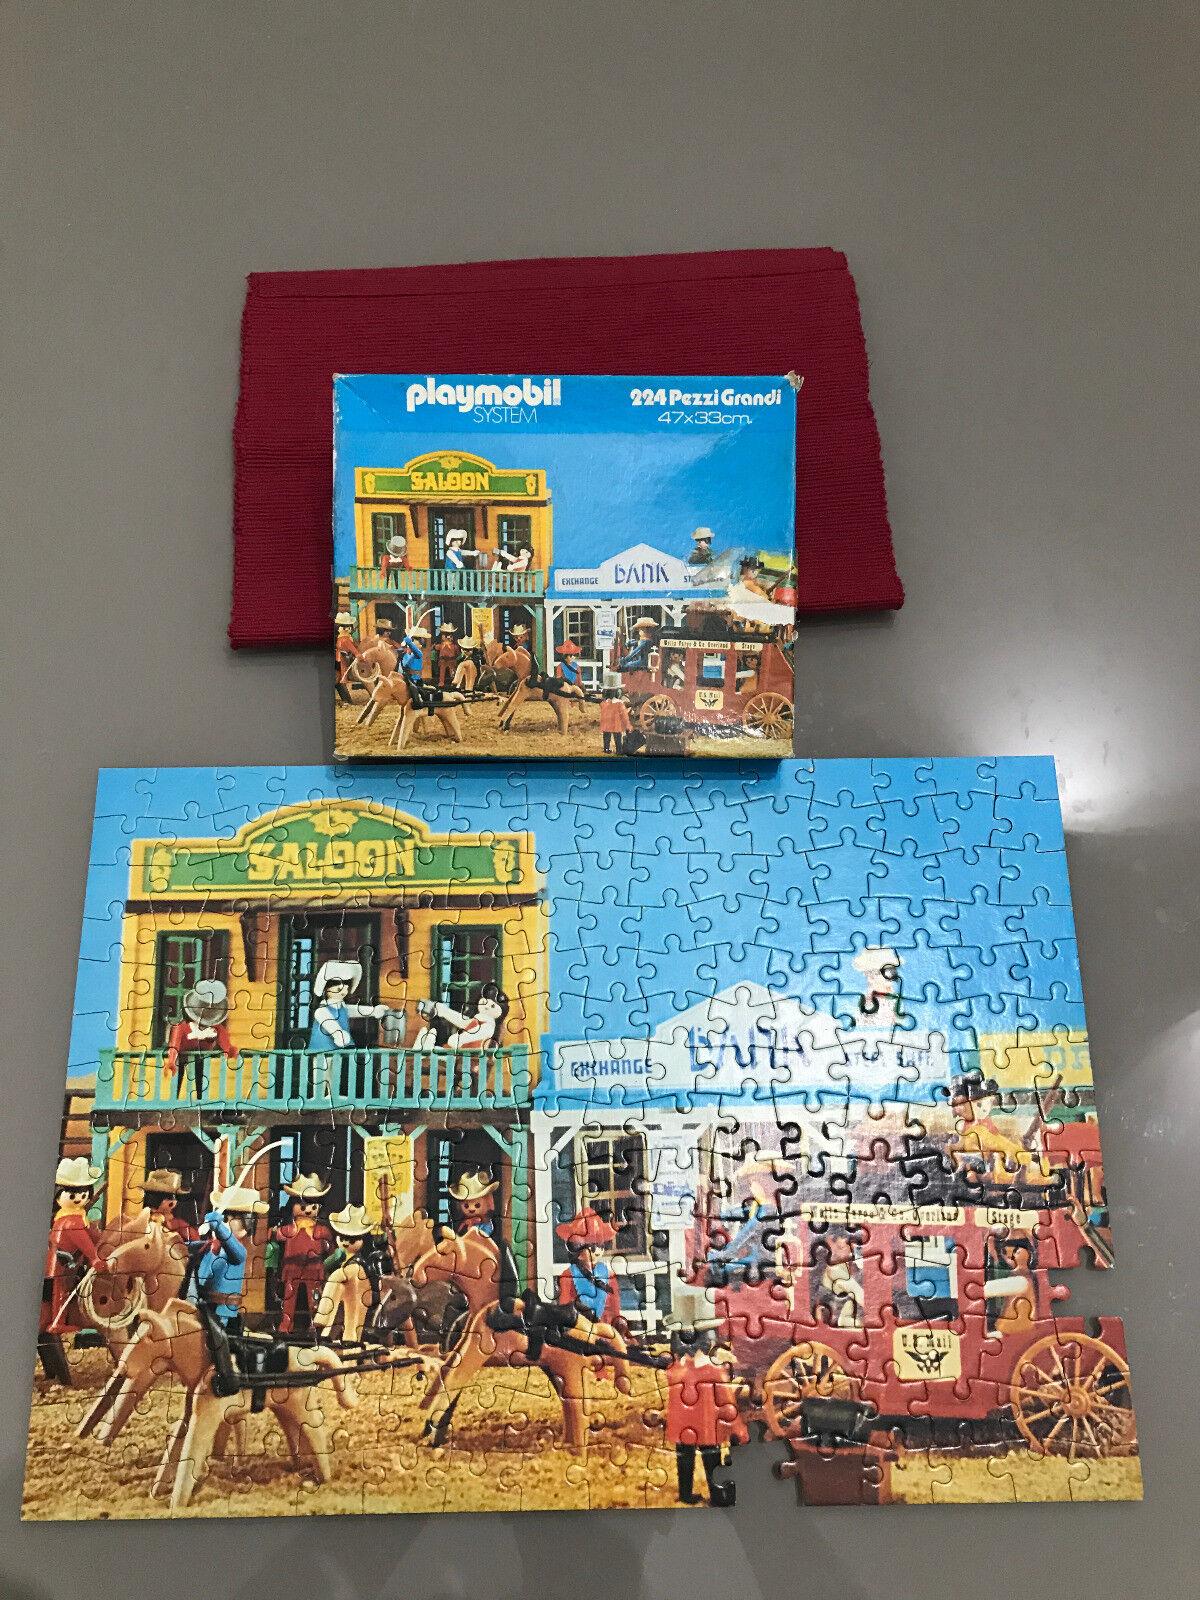 Playmobil System Puzzle GIG 7805 Cowboy 224 pezzi grandi